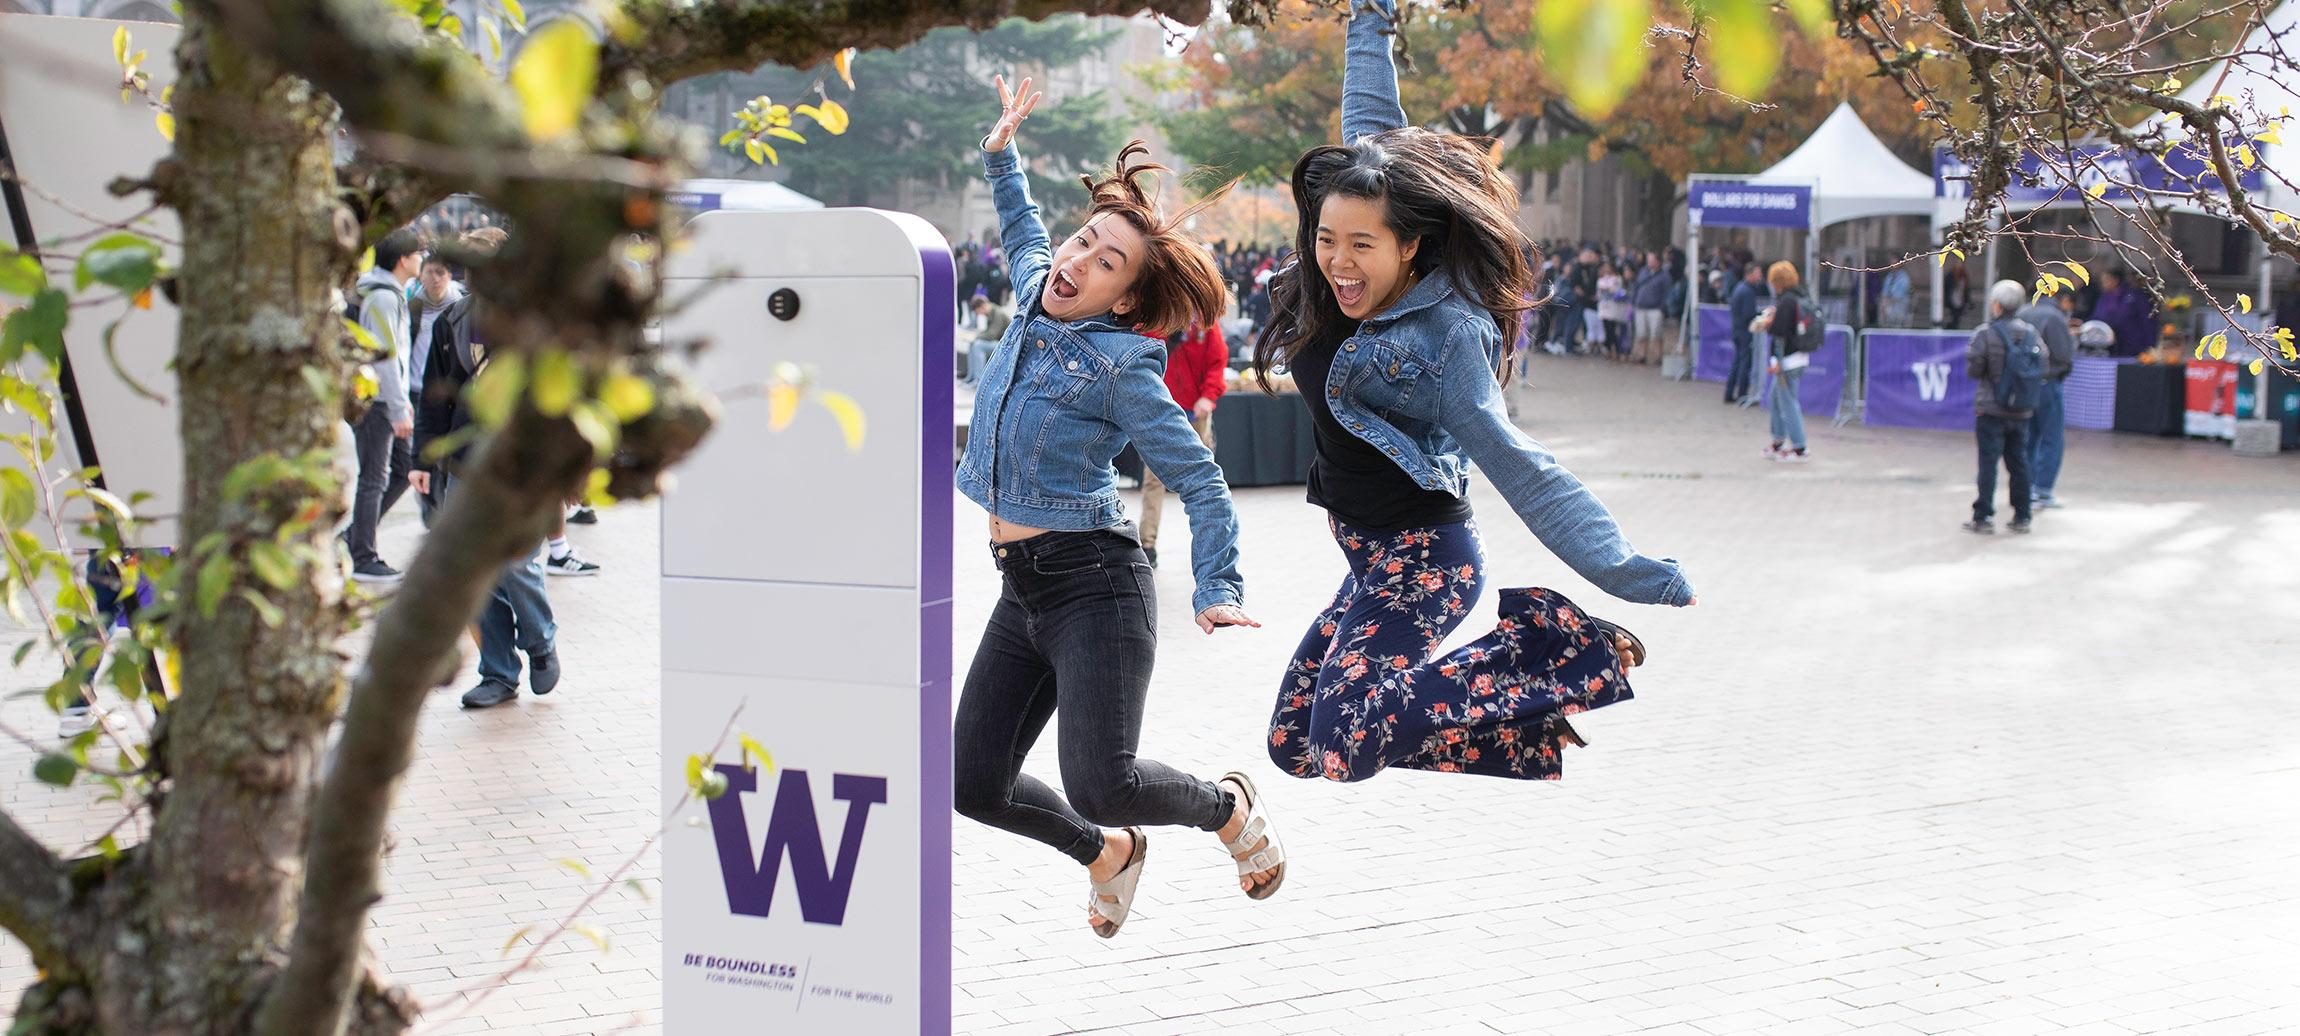 University Selfie Stand